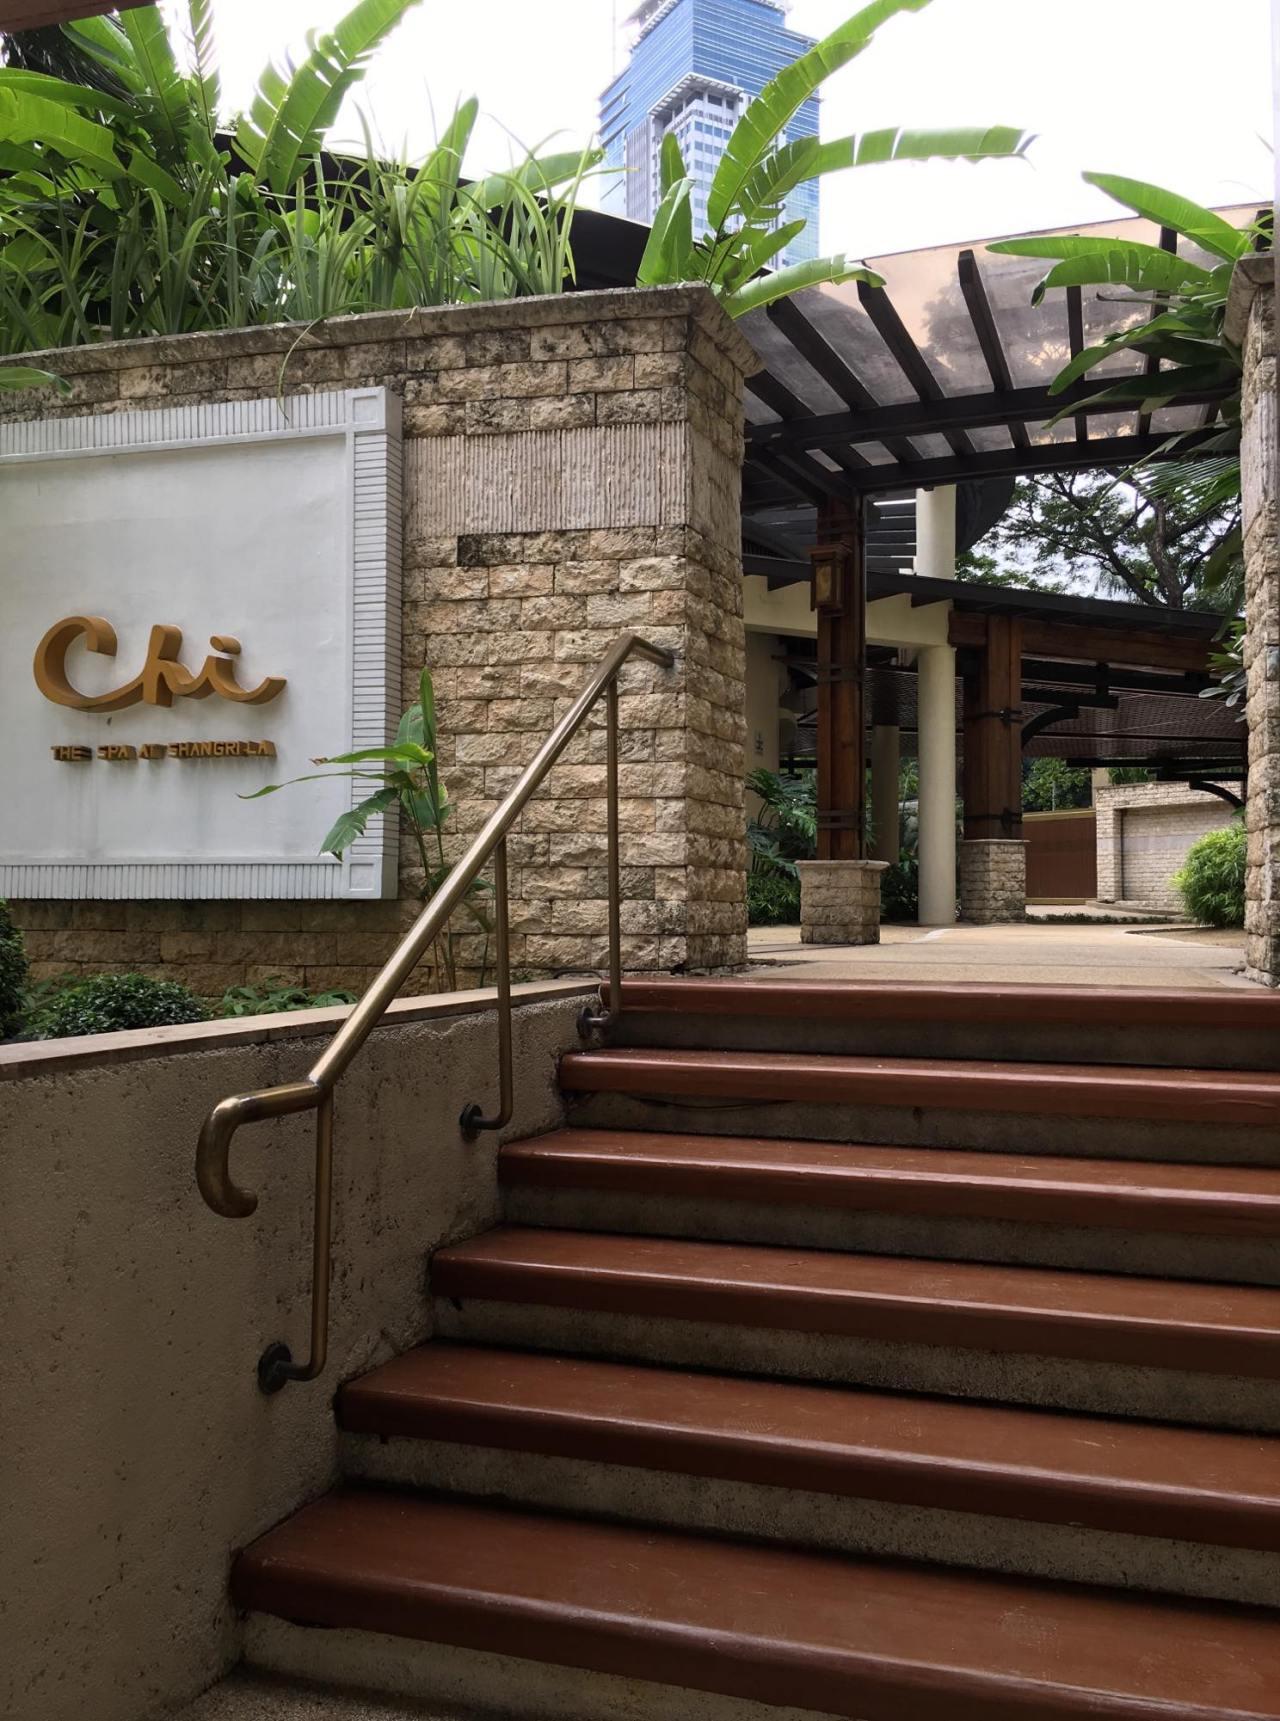 Chi, the Spa, where I had a massage during our celebration at Edsa Shangri-la